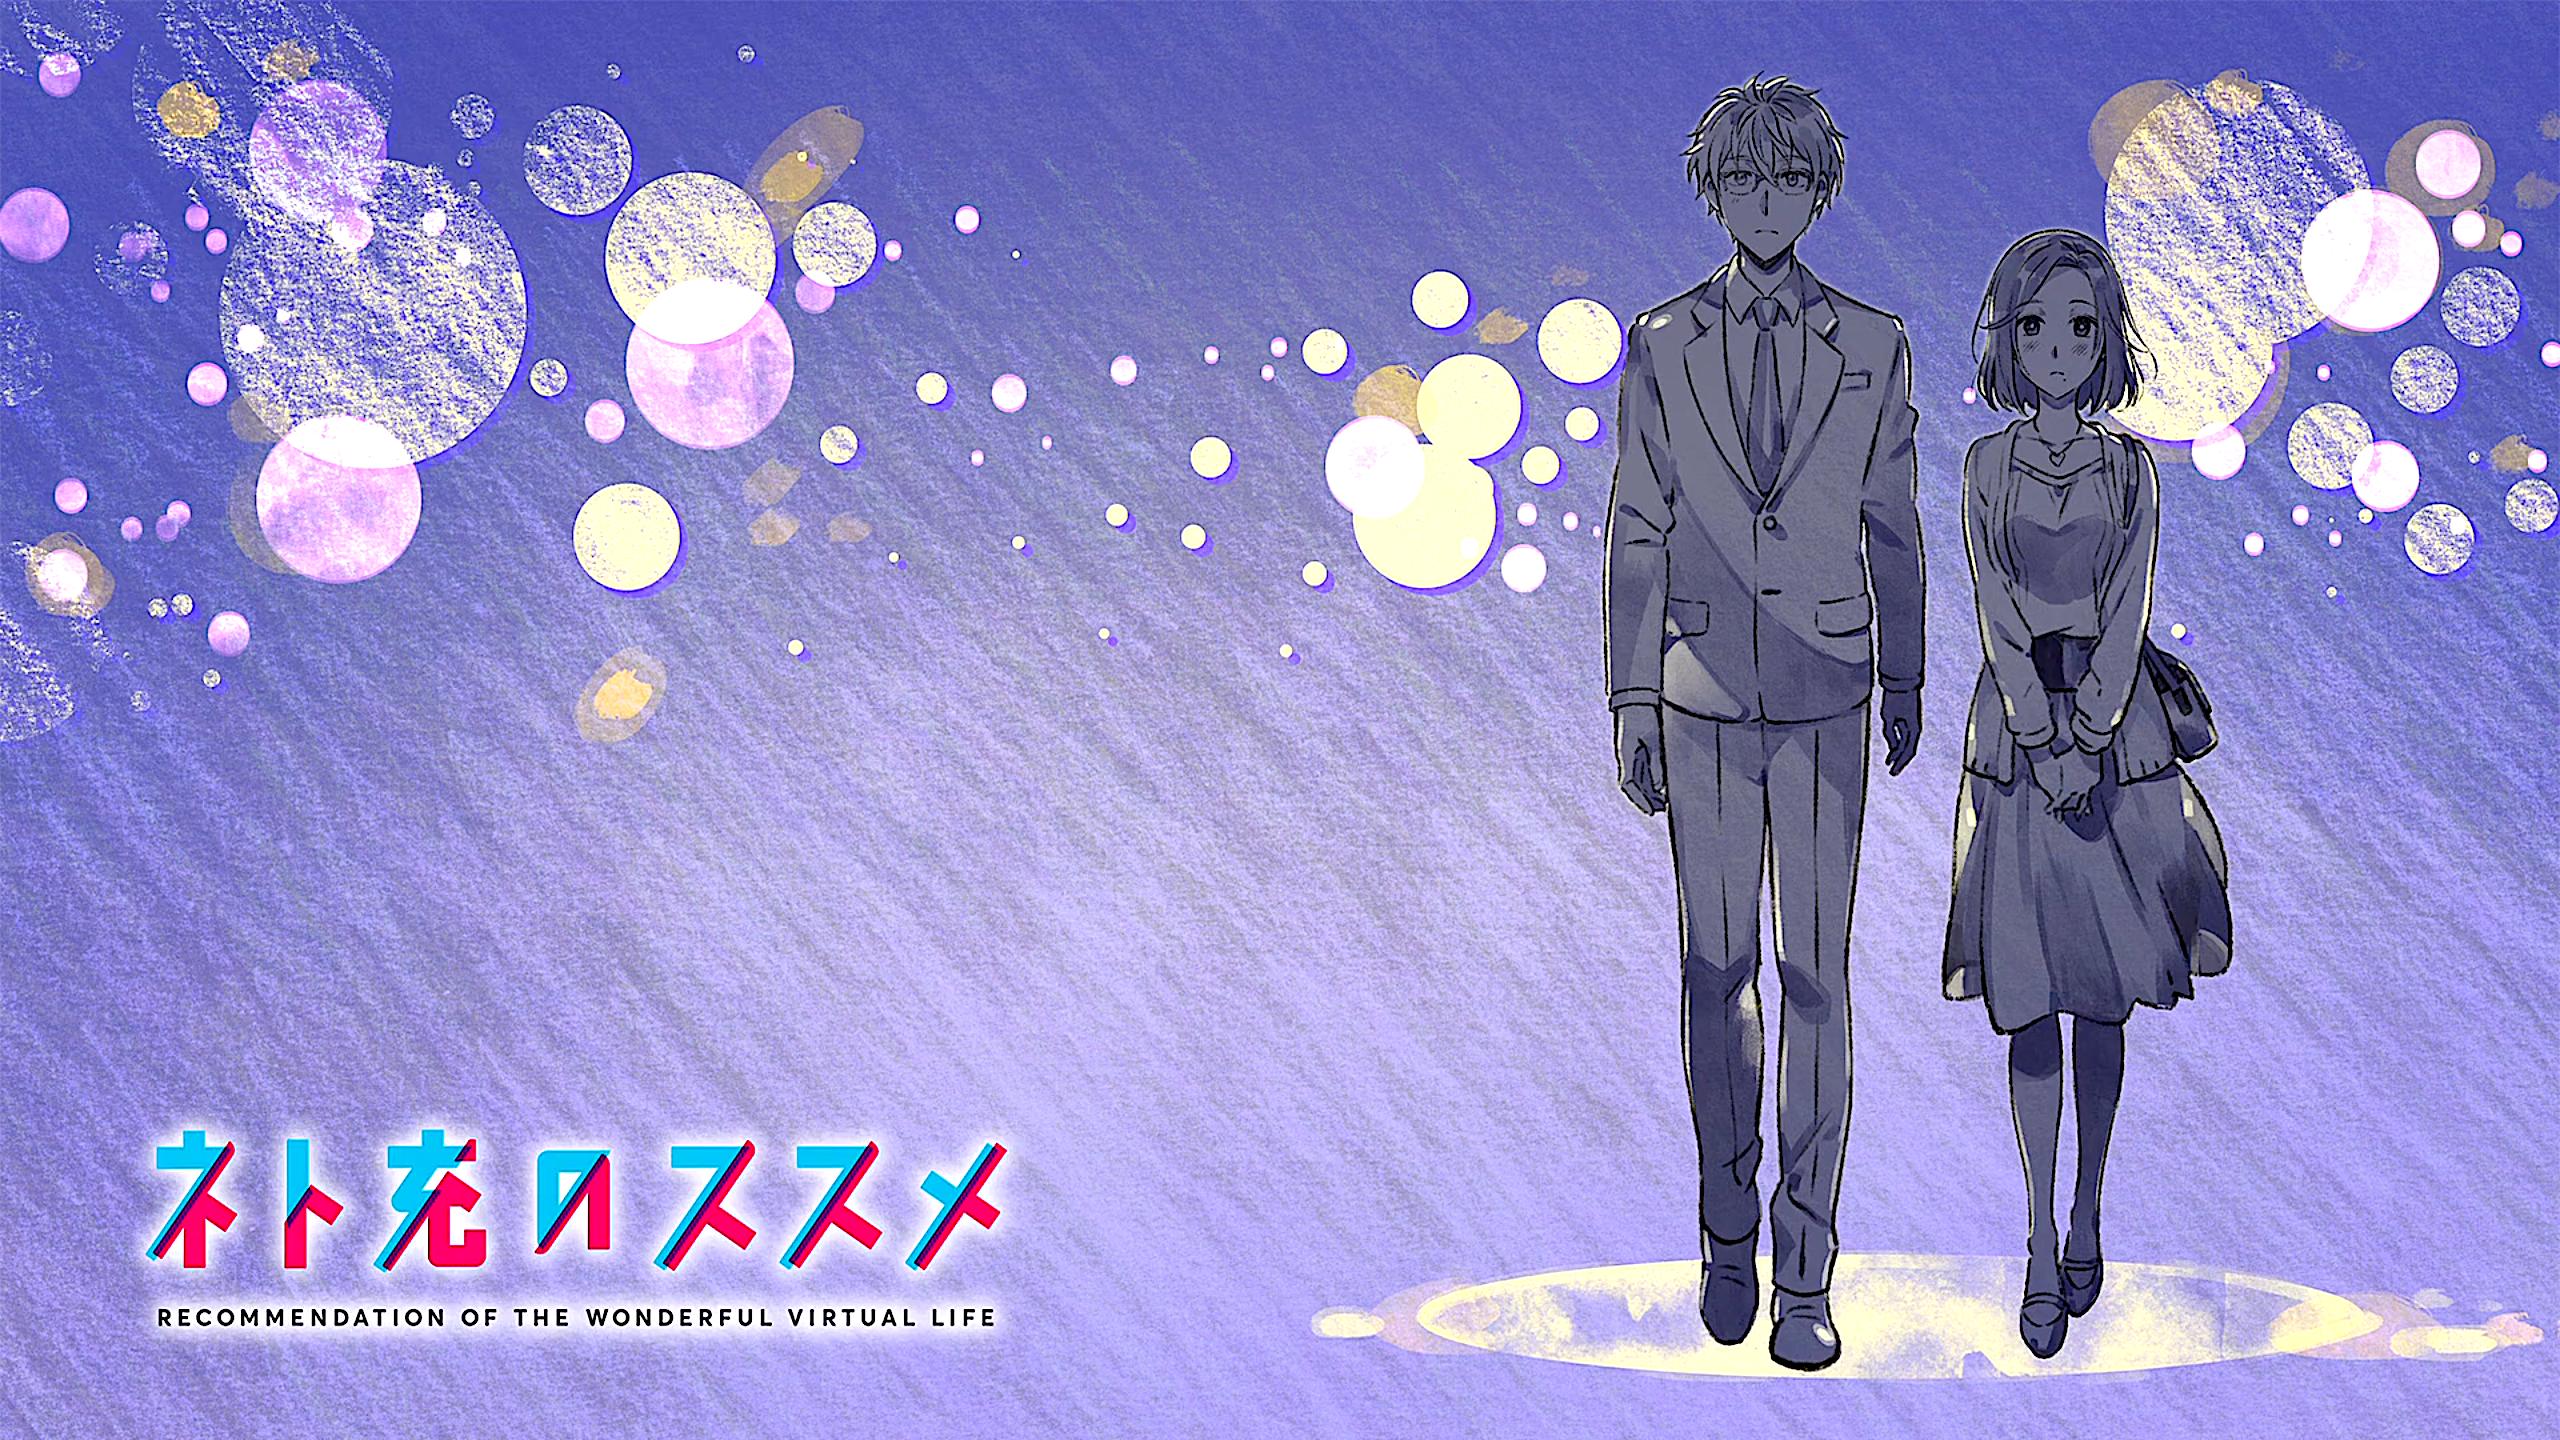 Sakurai X Moriko Hd Wallpaper Background Image 2560x1440 Id